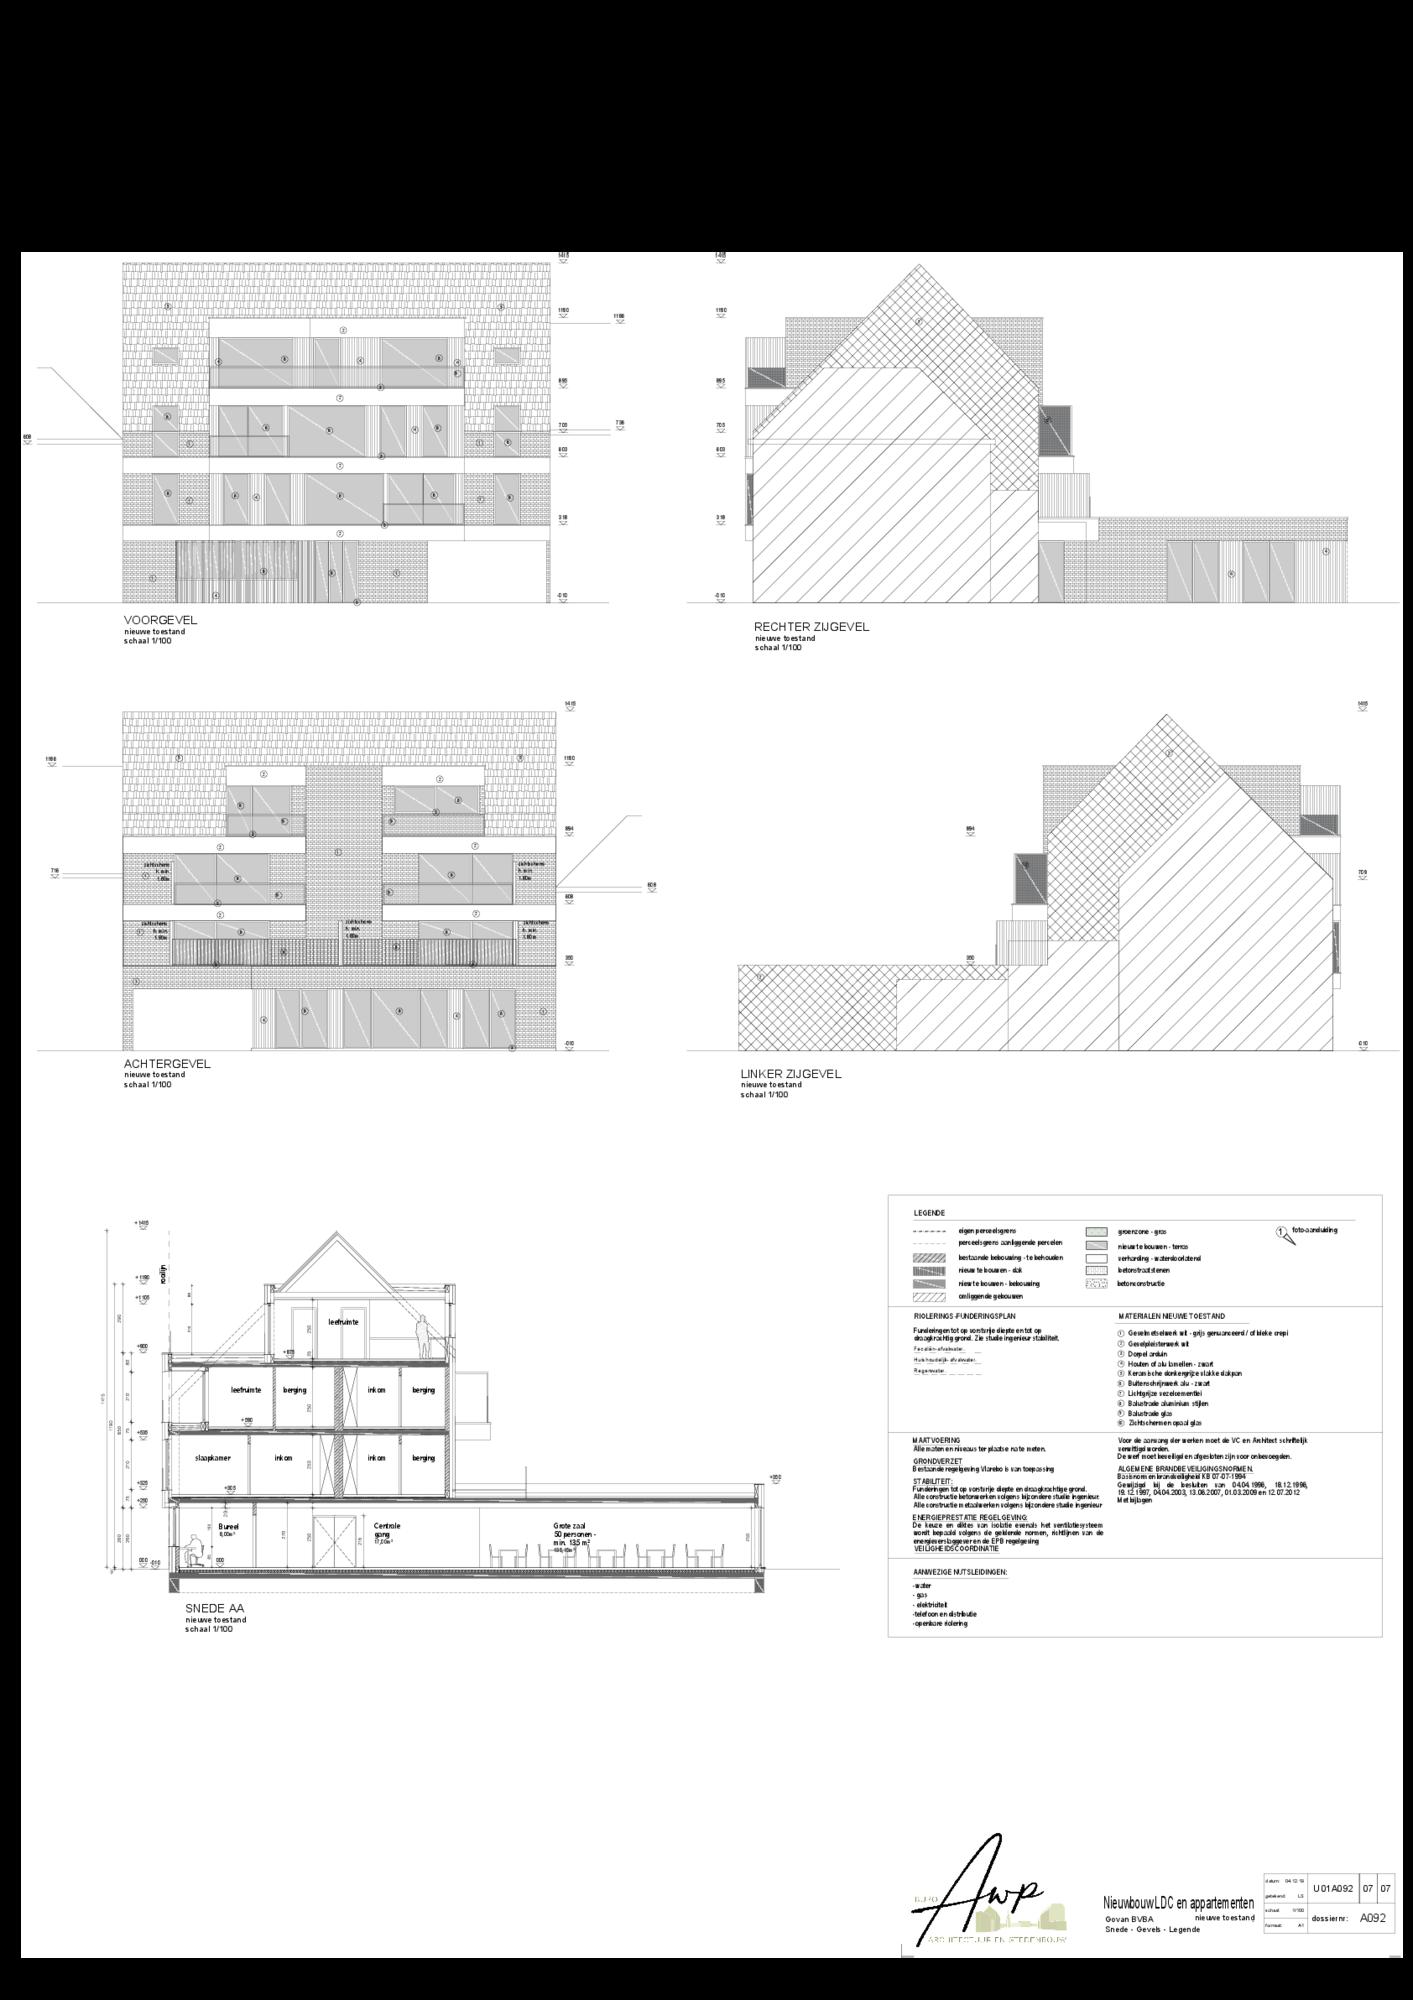 gevelssnedes.pdf